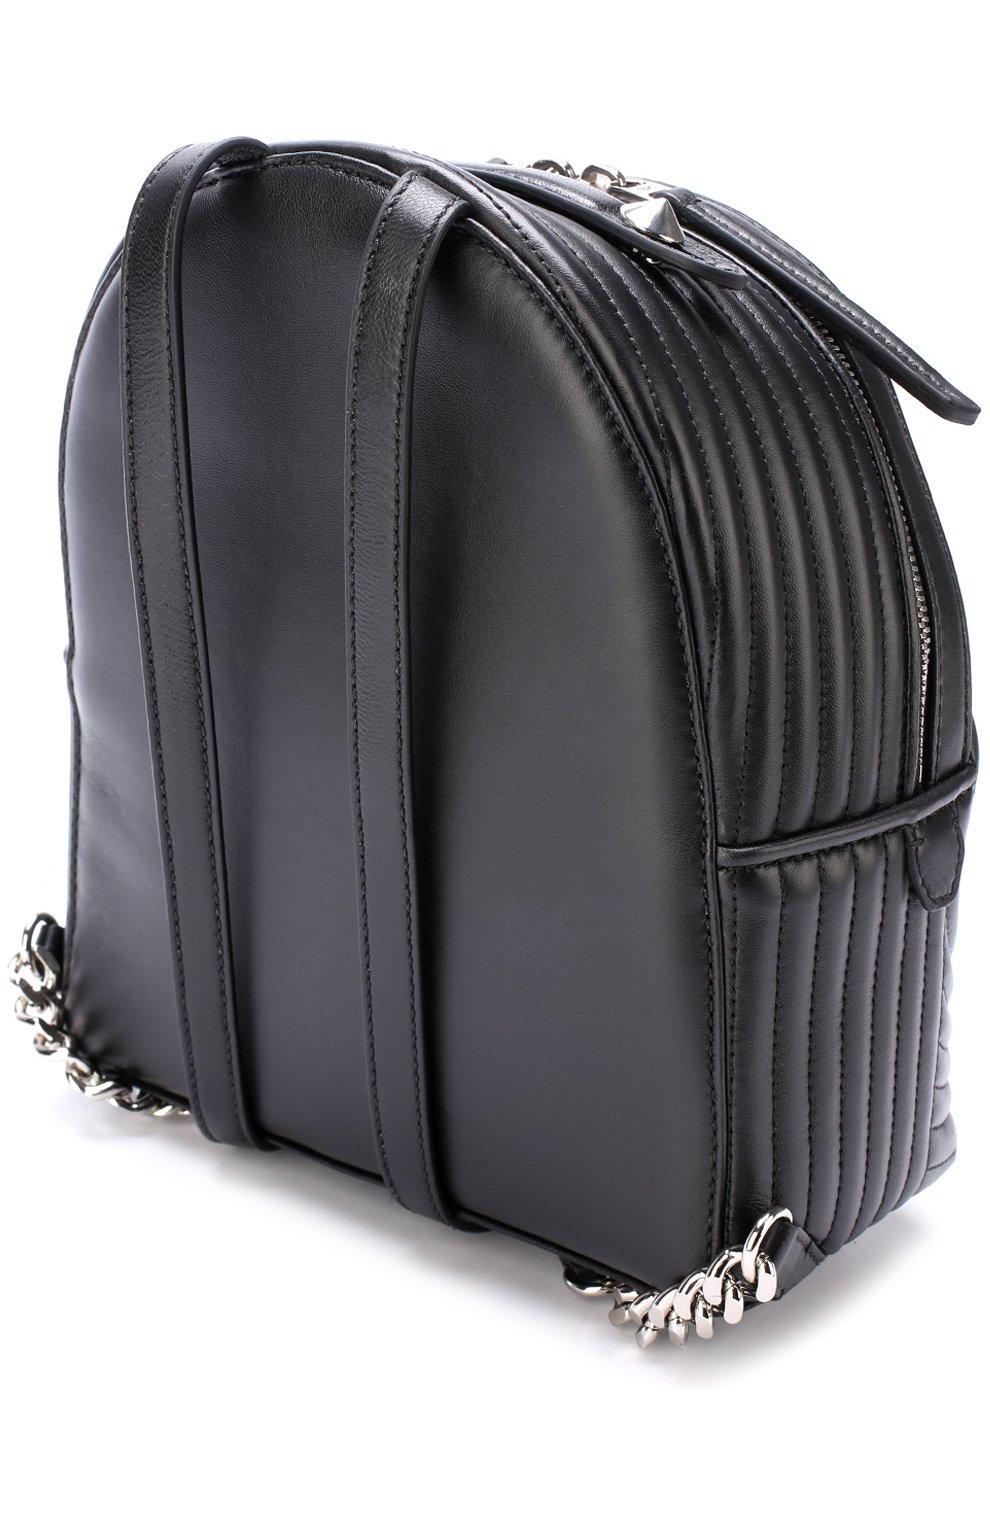 Рюкзак с металлической отделкой | Фото №3